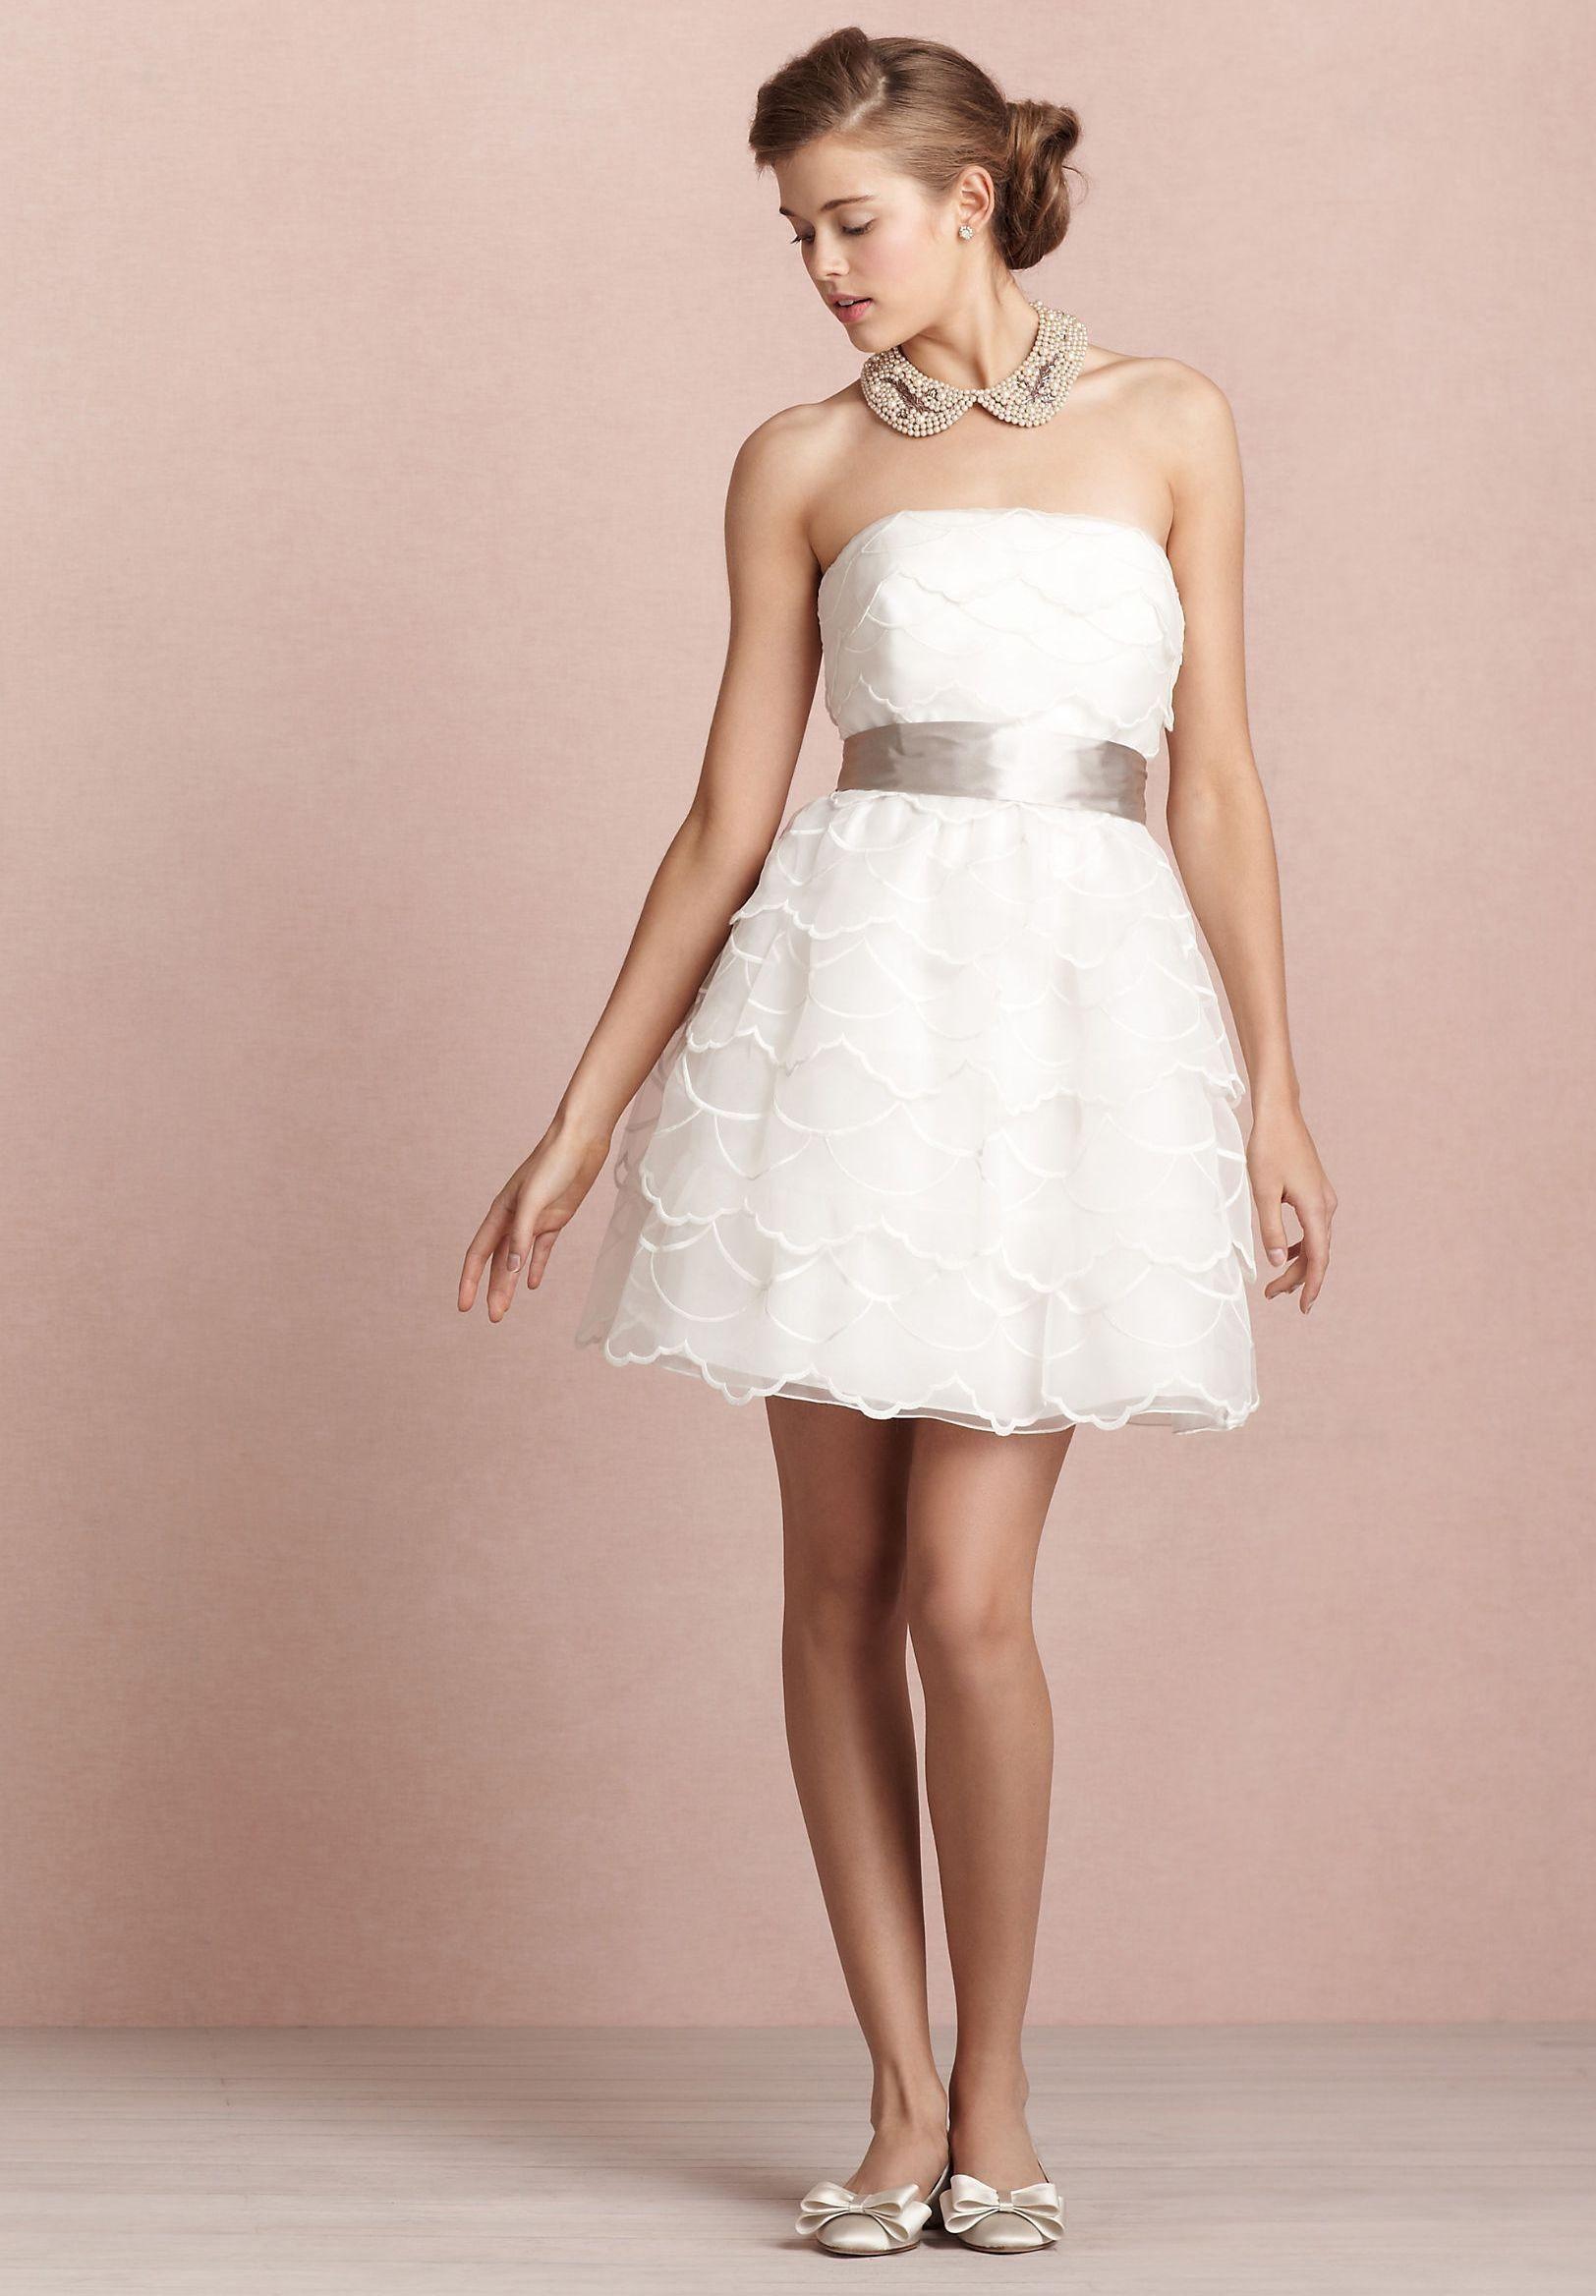 17 Best images about Wedding Reception Dresses on Pinterest - Jim ...